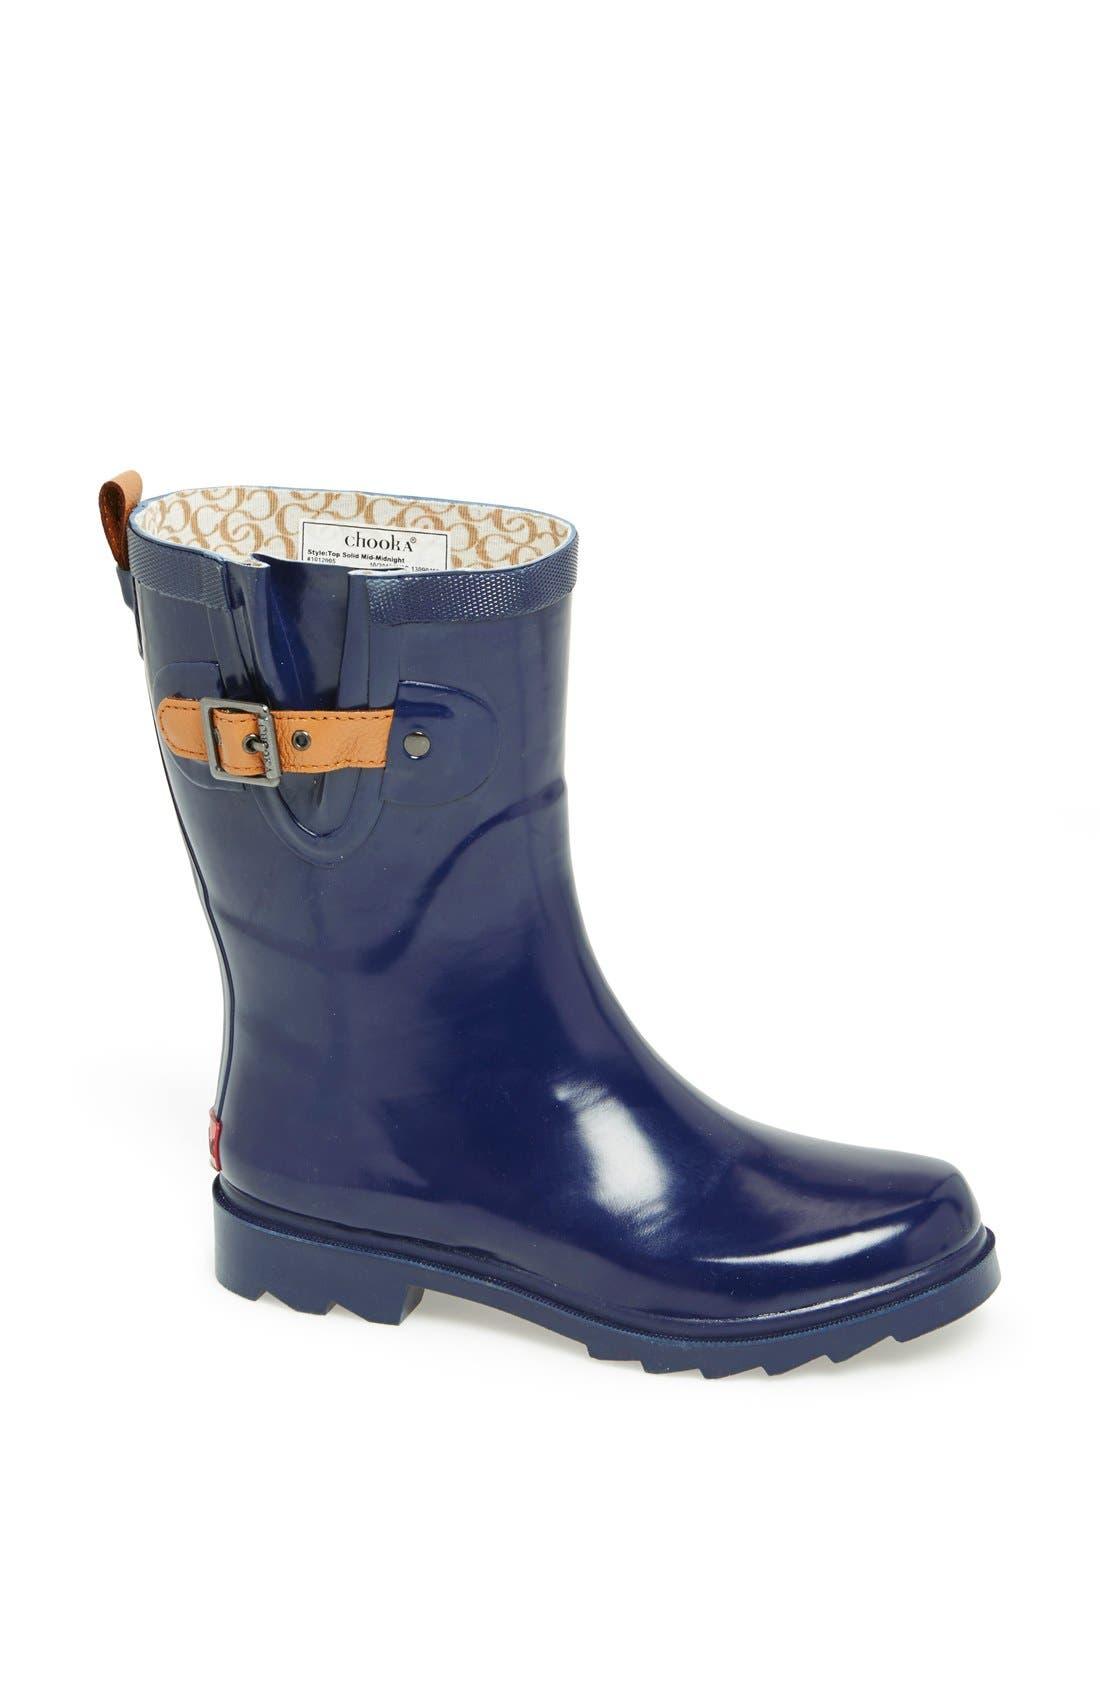 Alternate Image 1 Selected - Chooka 'Top Solid Mid Height' Rain Boot (Women)